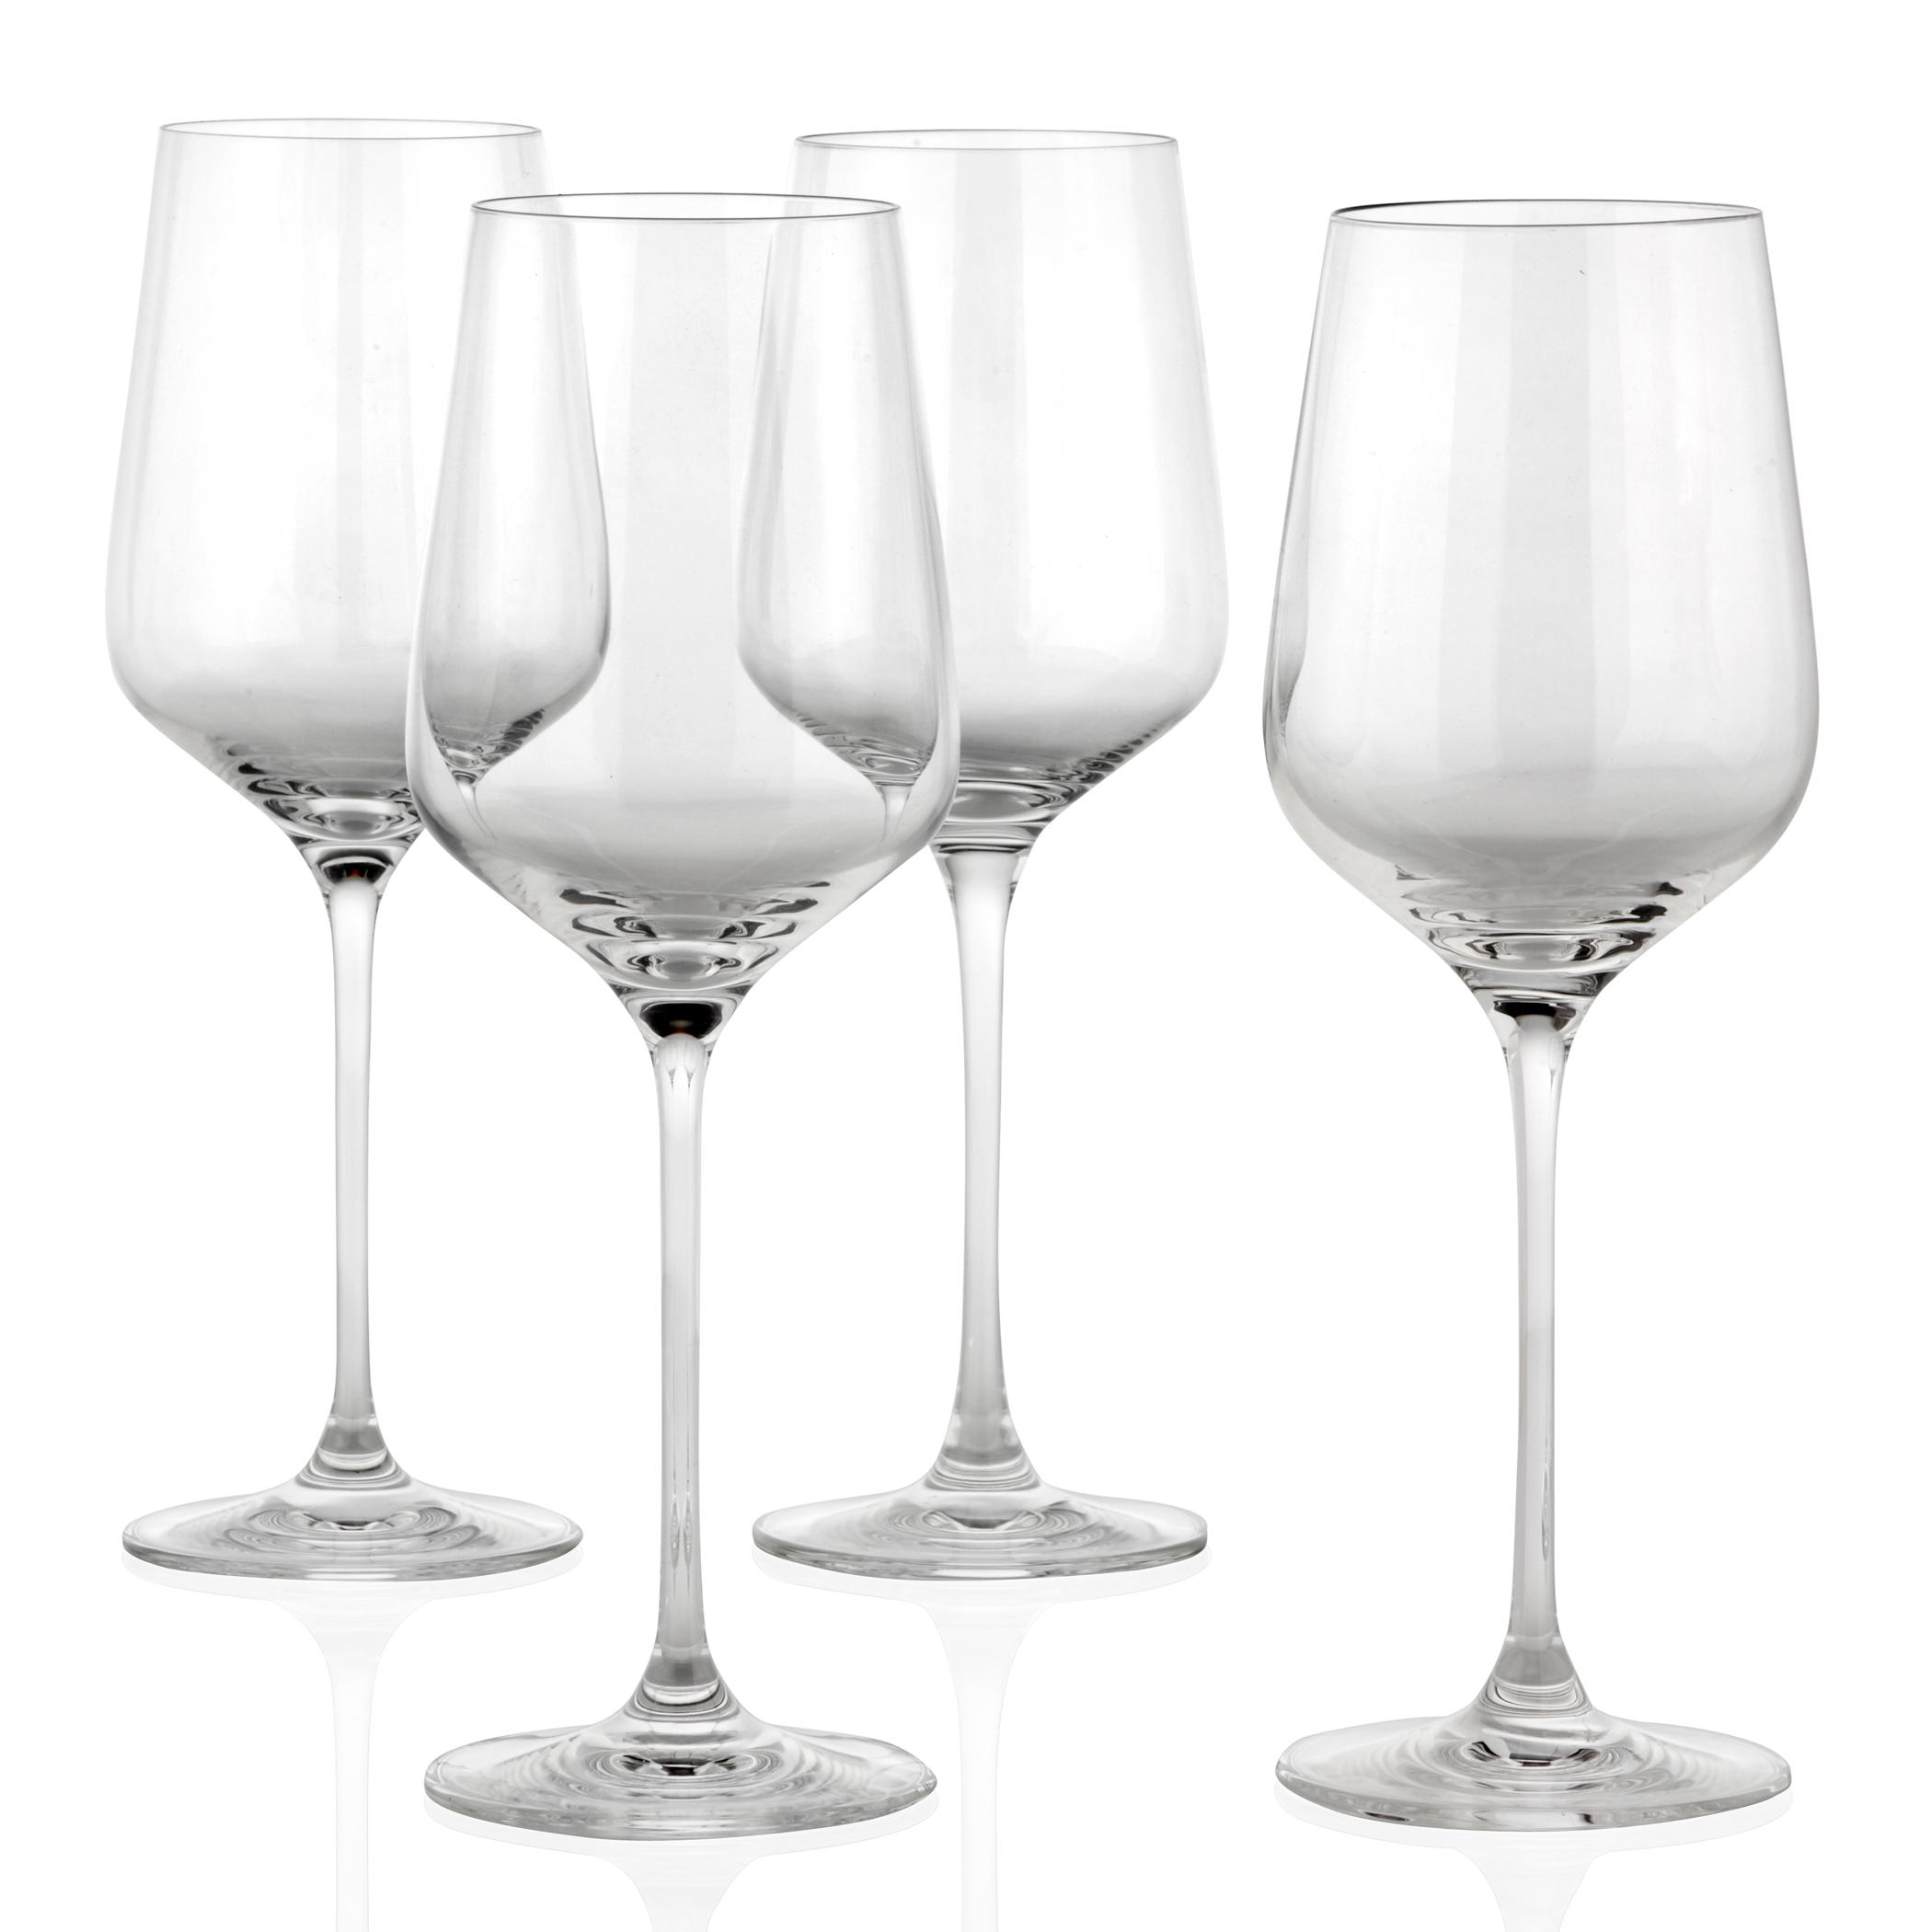 white wine glass - set of 4